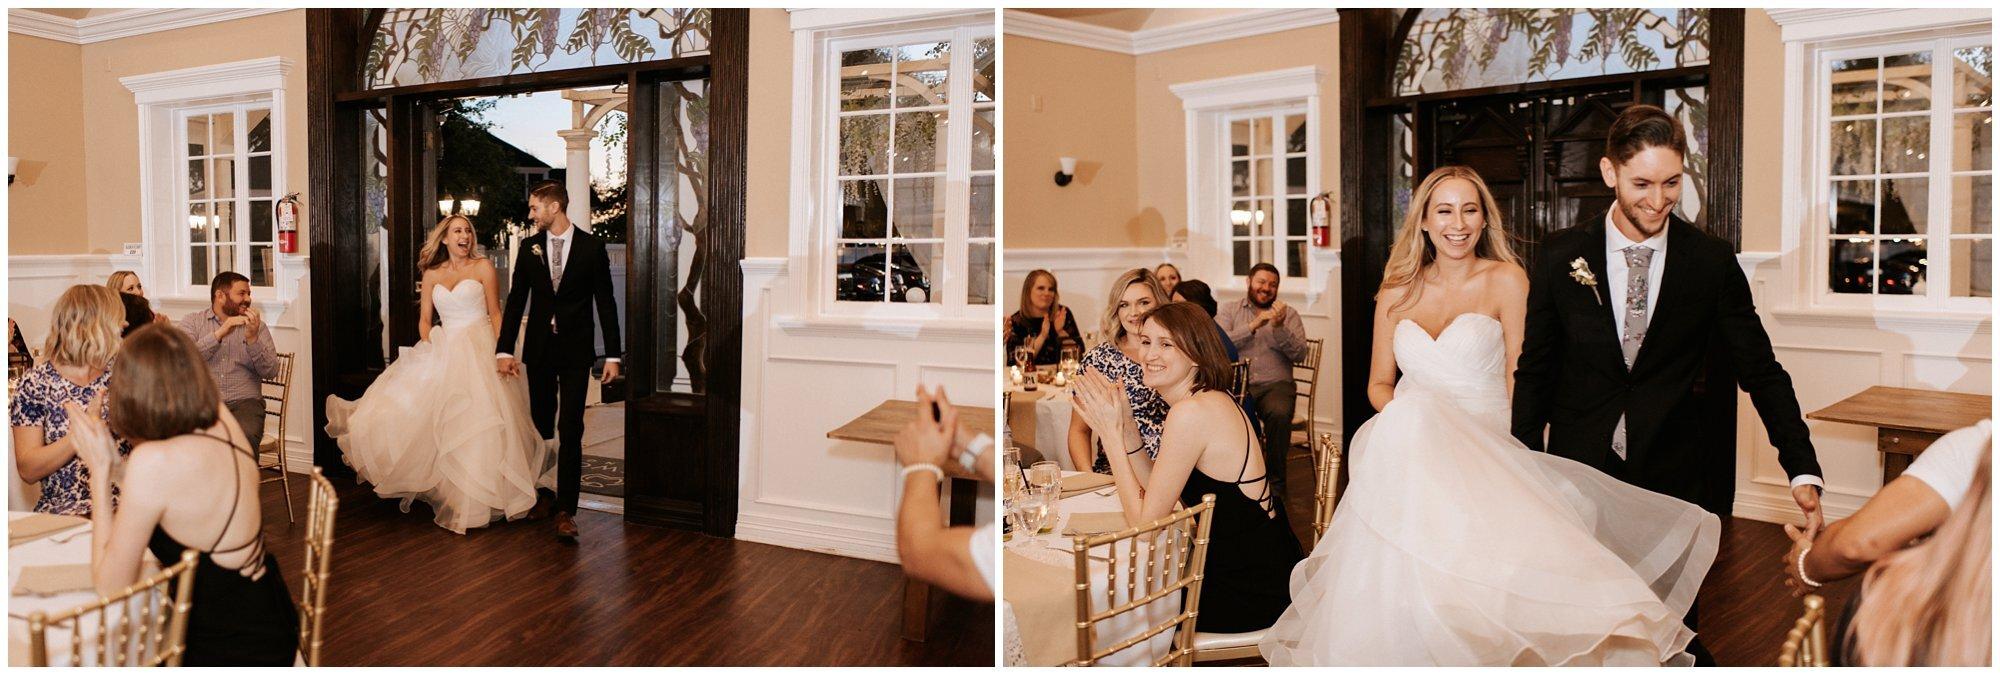 Wedgewood_Lindsay_Groves-Arizona-Wedding-Photographer-M+C_0062.jpg